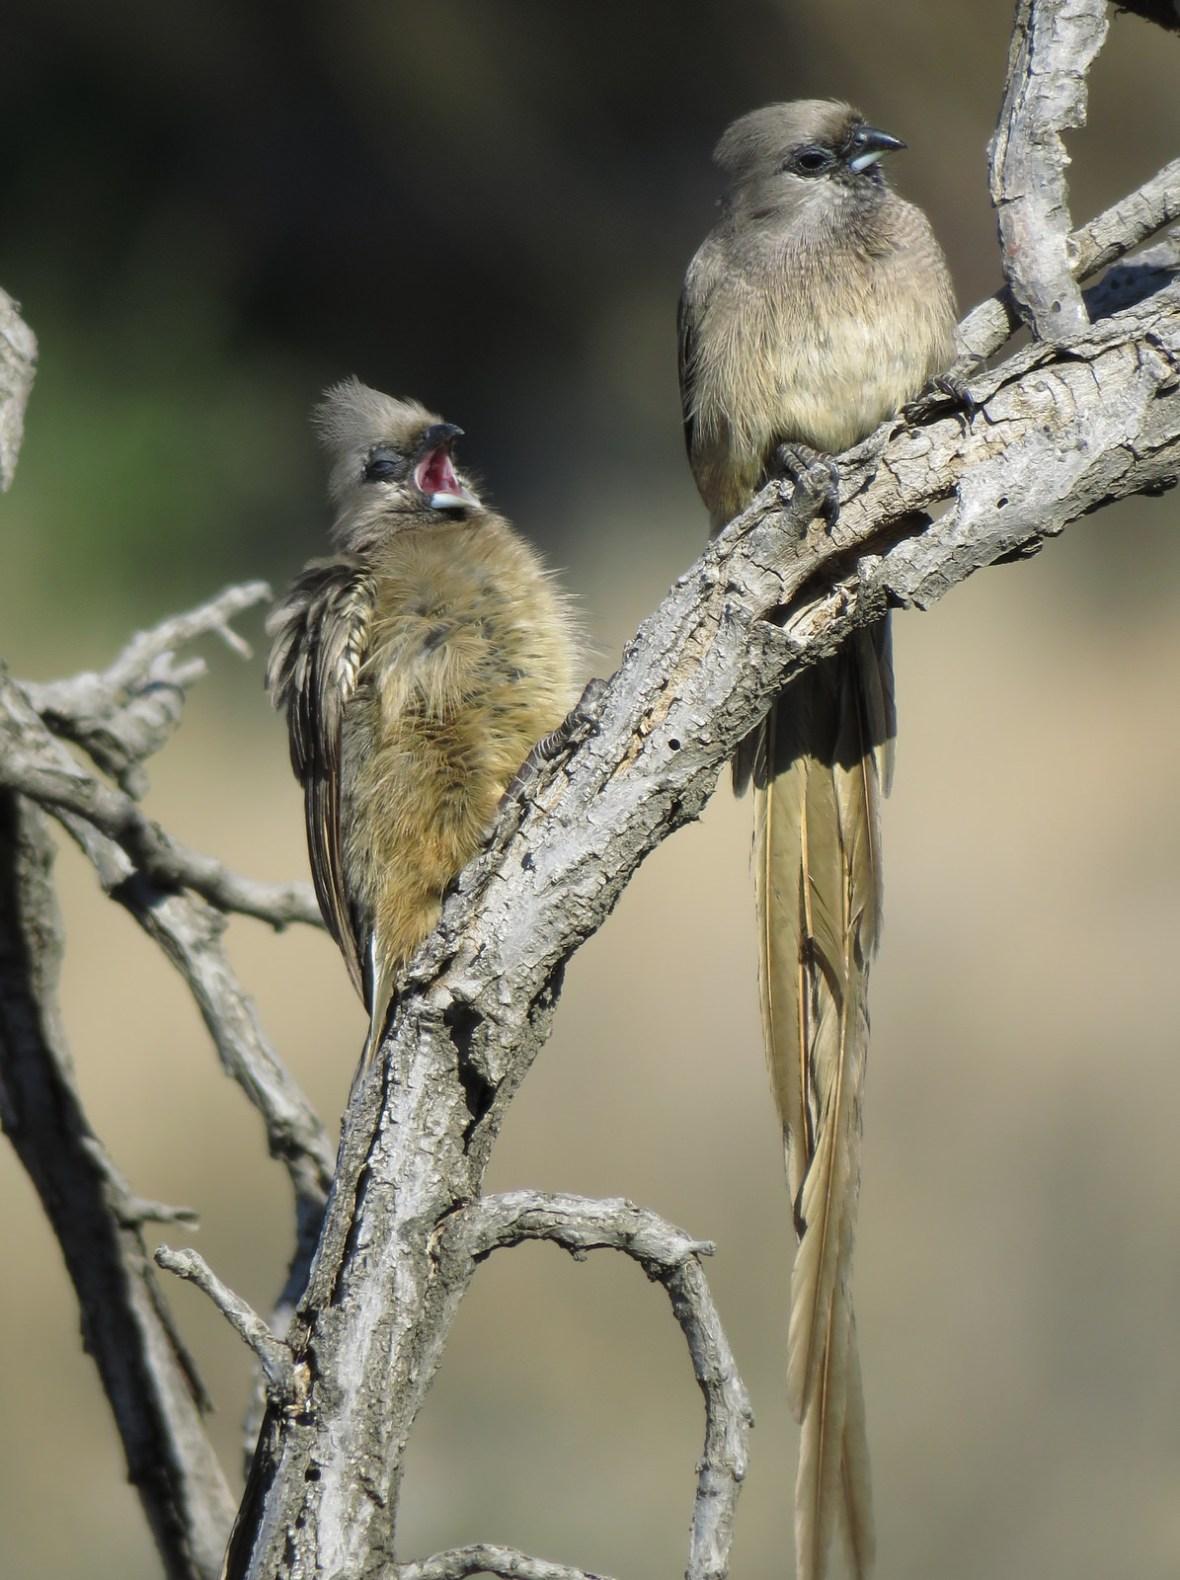 Mouse birds